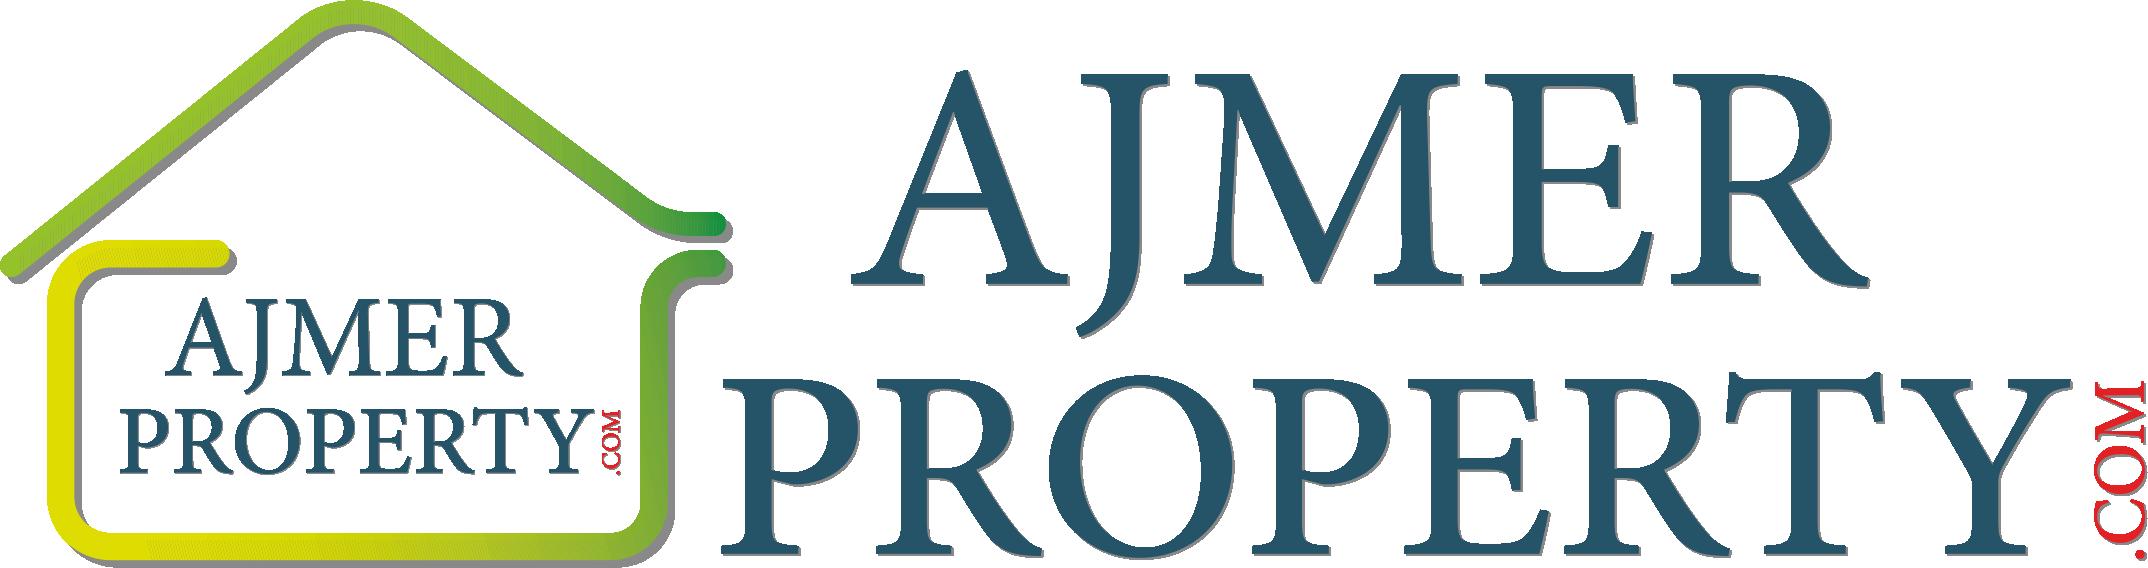 Ajmer Property